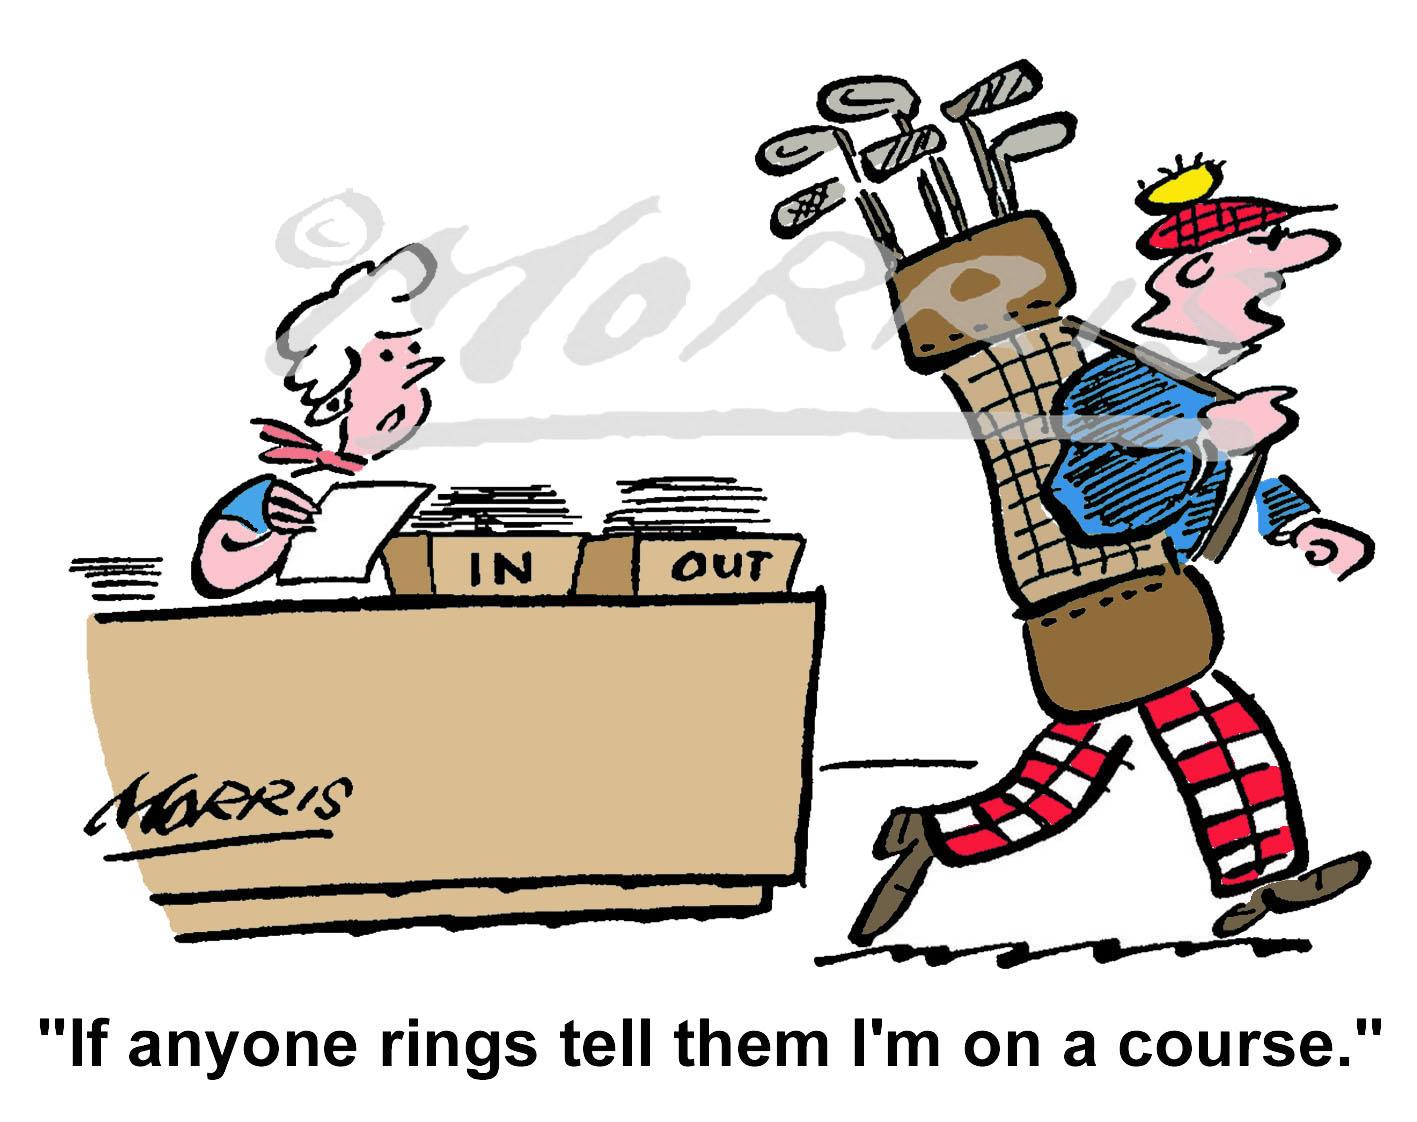 Golf cartoon, golfing cartoon, golf course cartoon, – Ref: 1021col